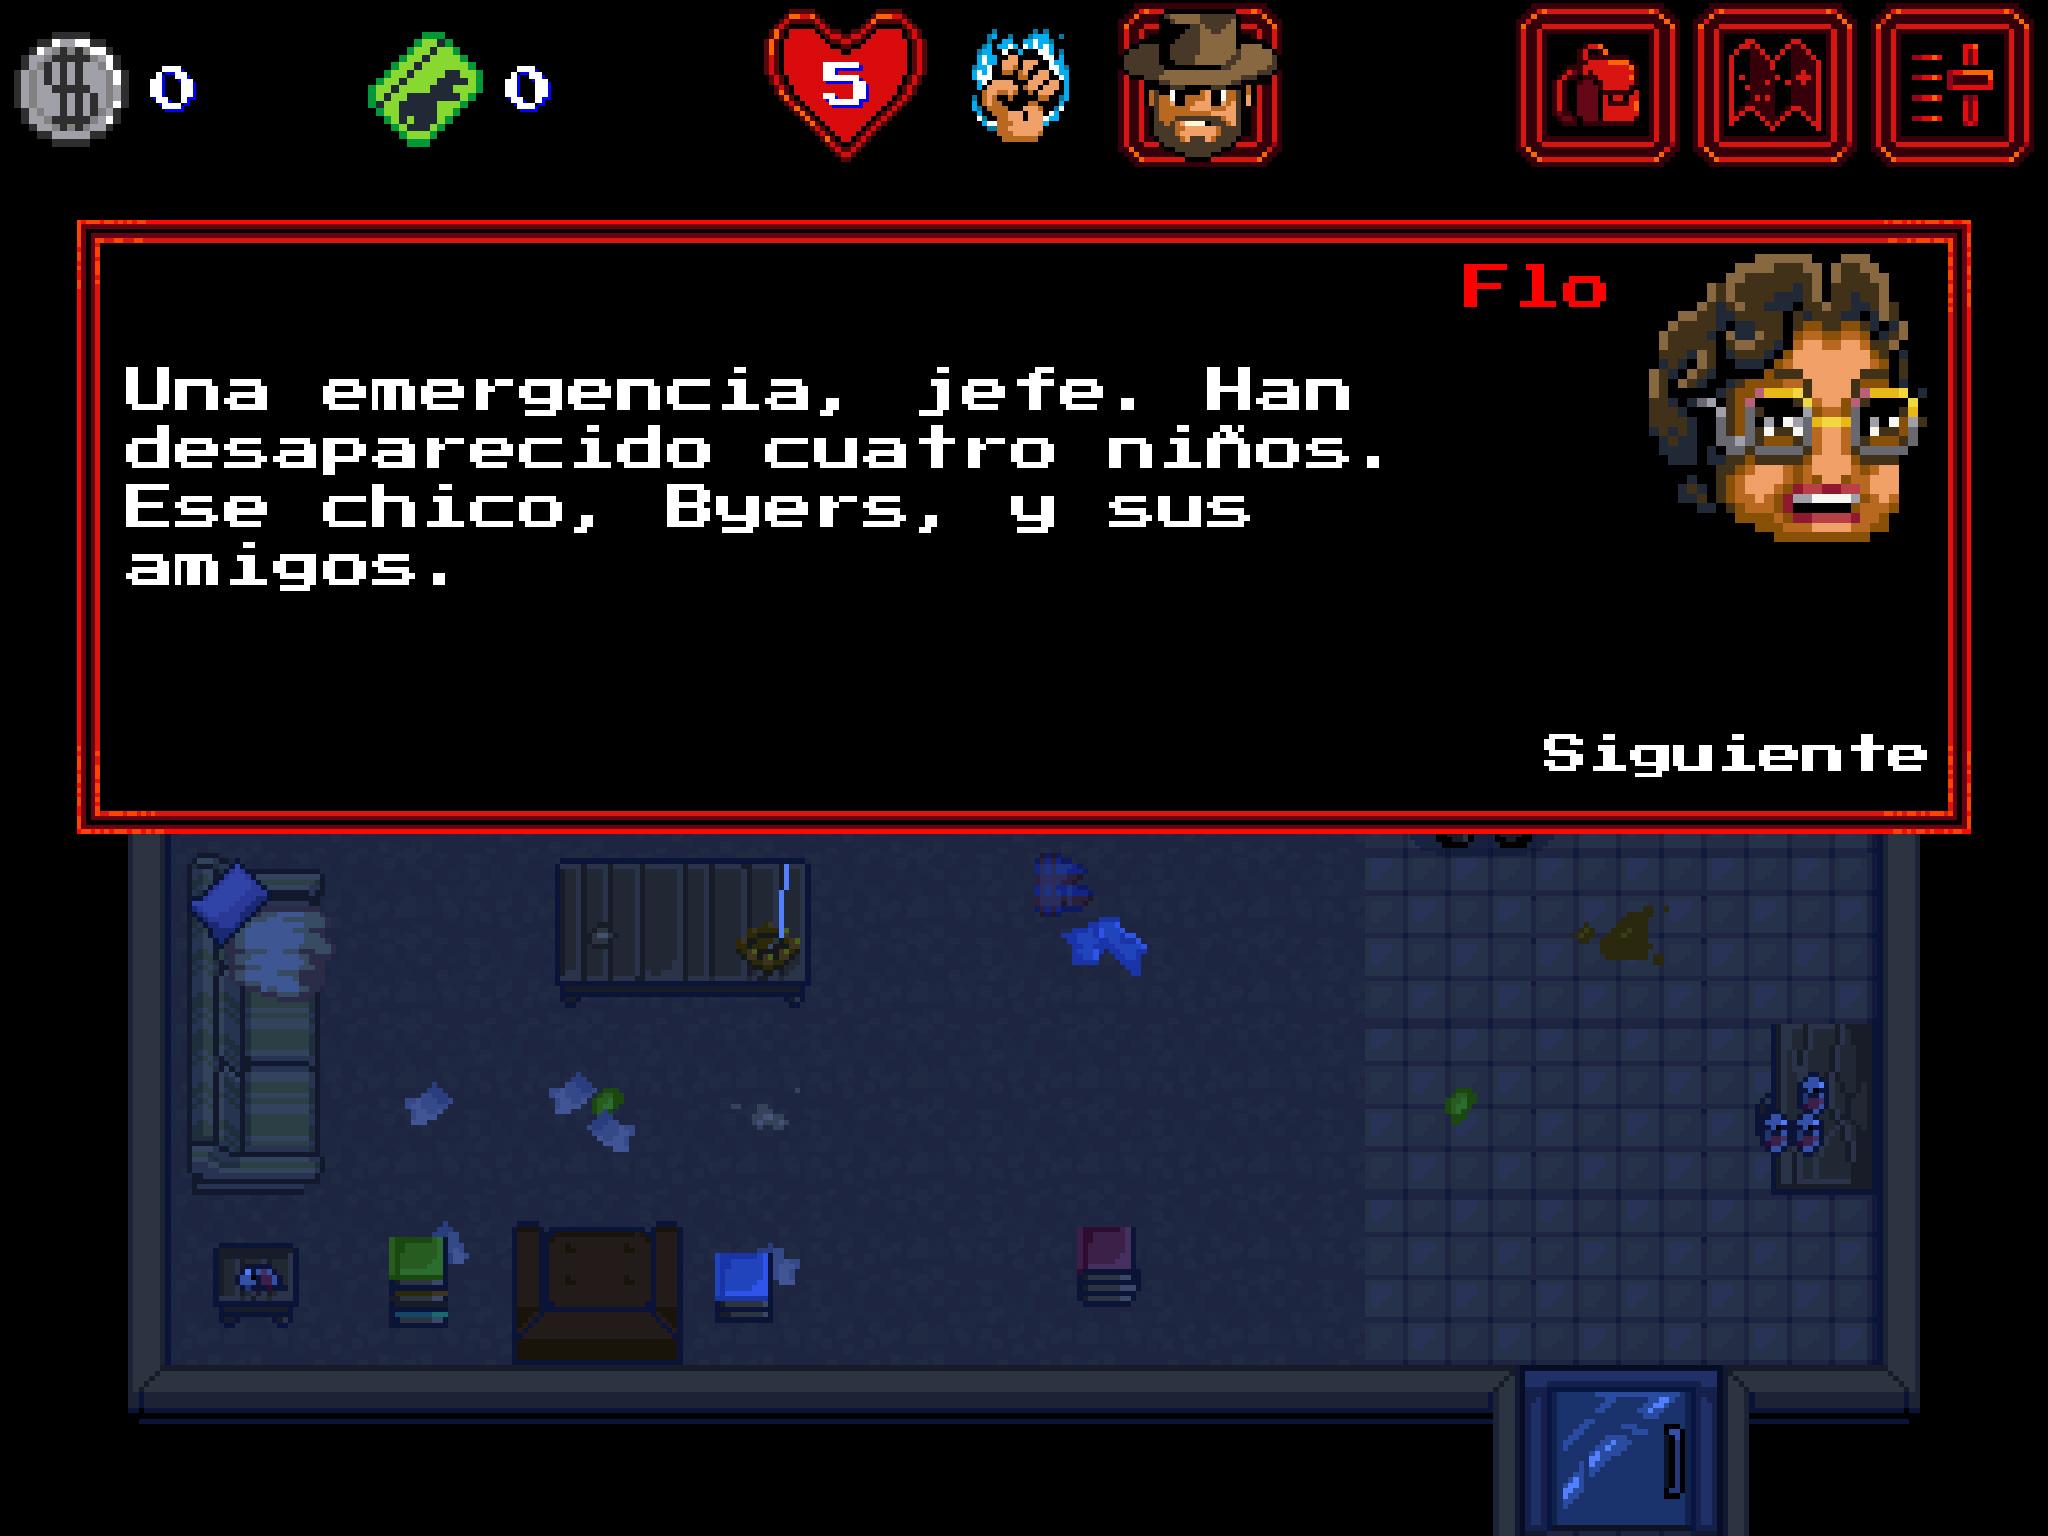 Stranger Things: El juego